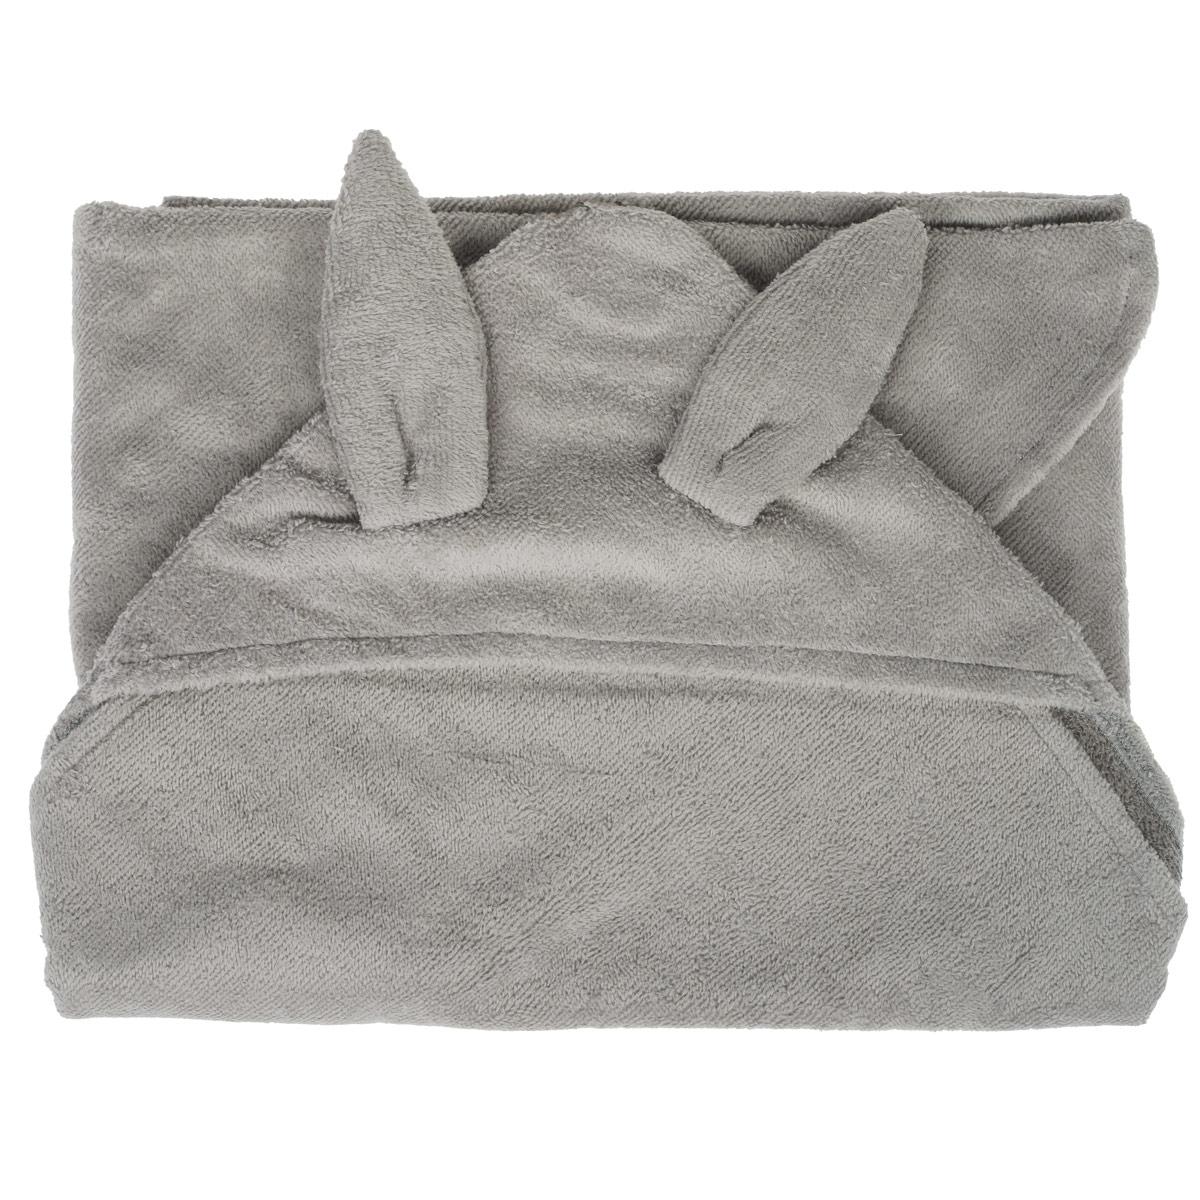 Полотенце-уголок после купания Elodie Details